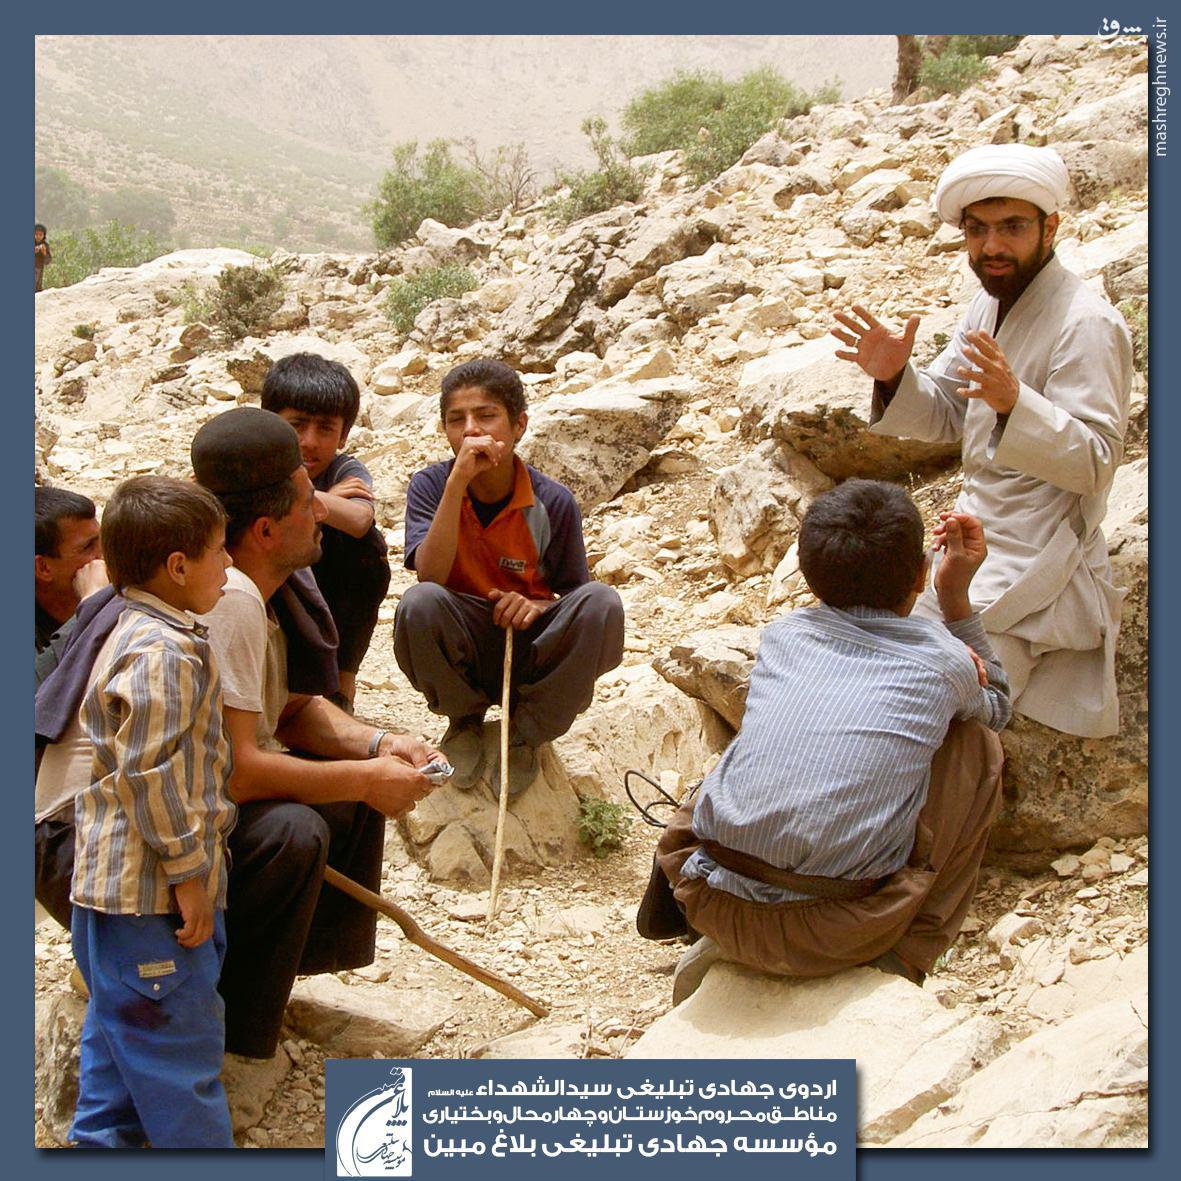 گروه جهادی - تبلیغی «بلاغ مبین» عازم شدند + عکس